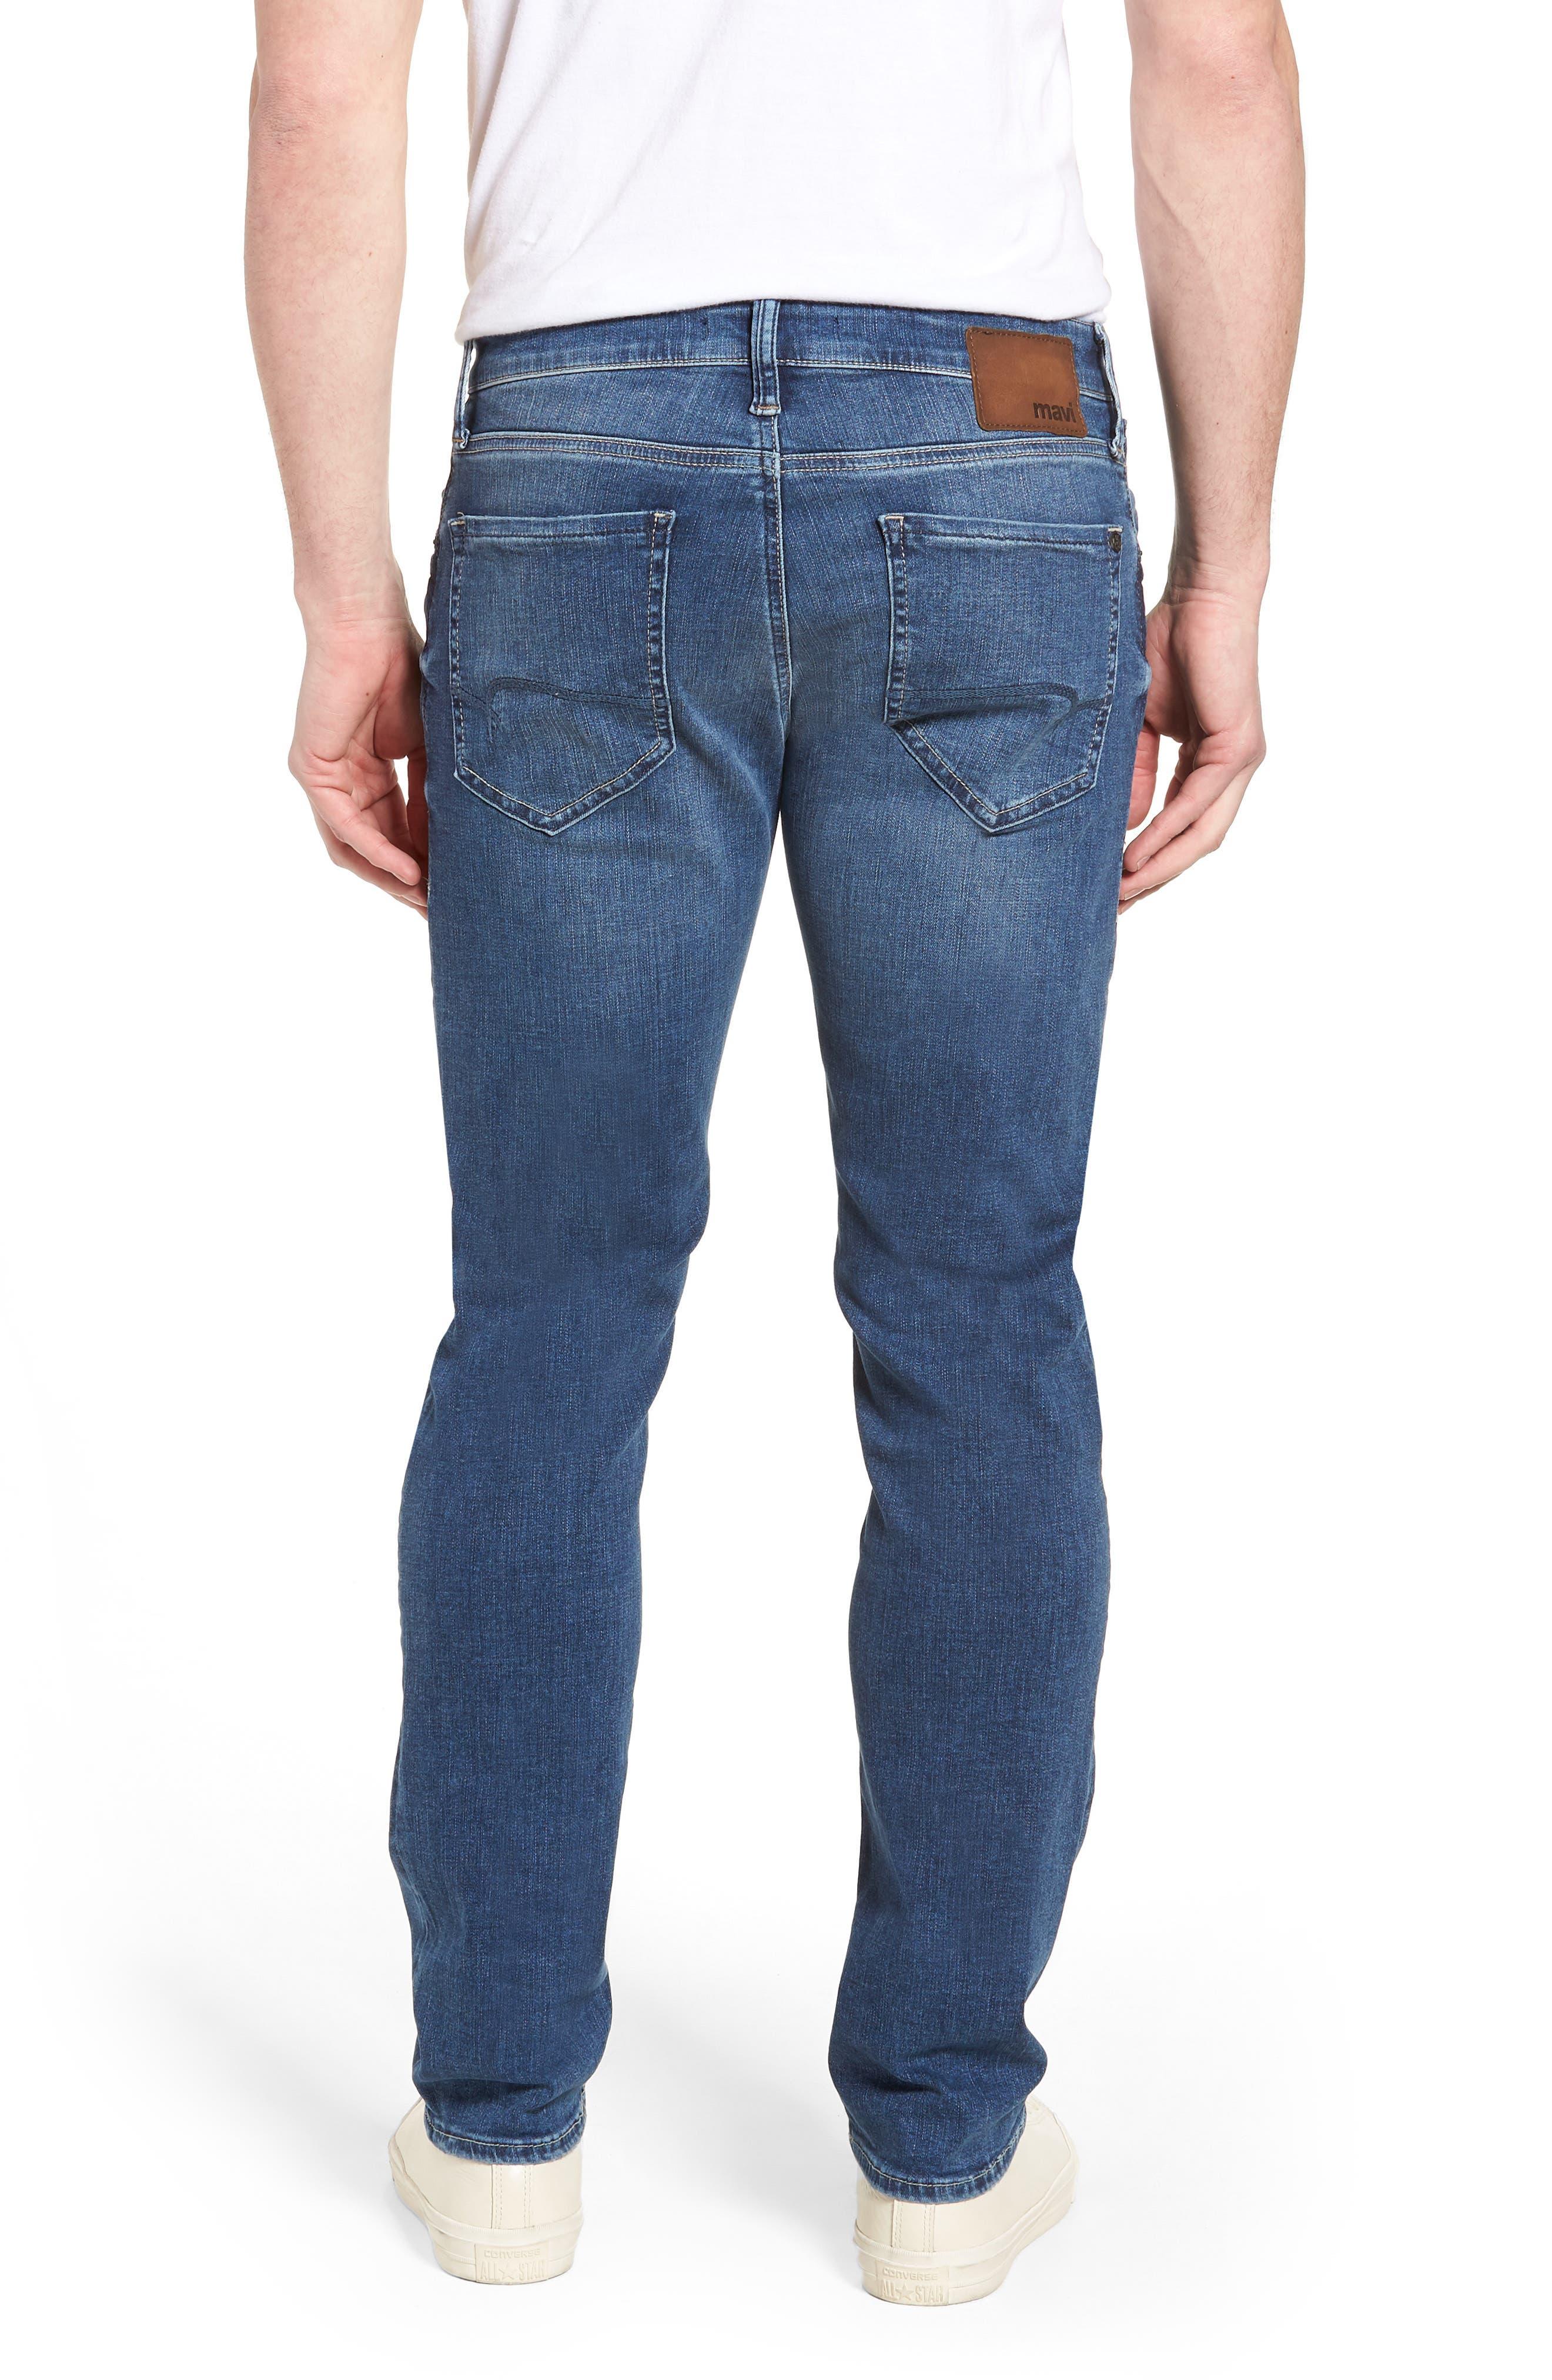 Zach Straight Leg Jeans,                             Alternate thumbnail 2, color,                             Indigo Cashmere